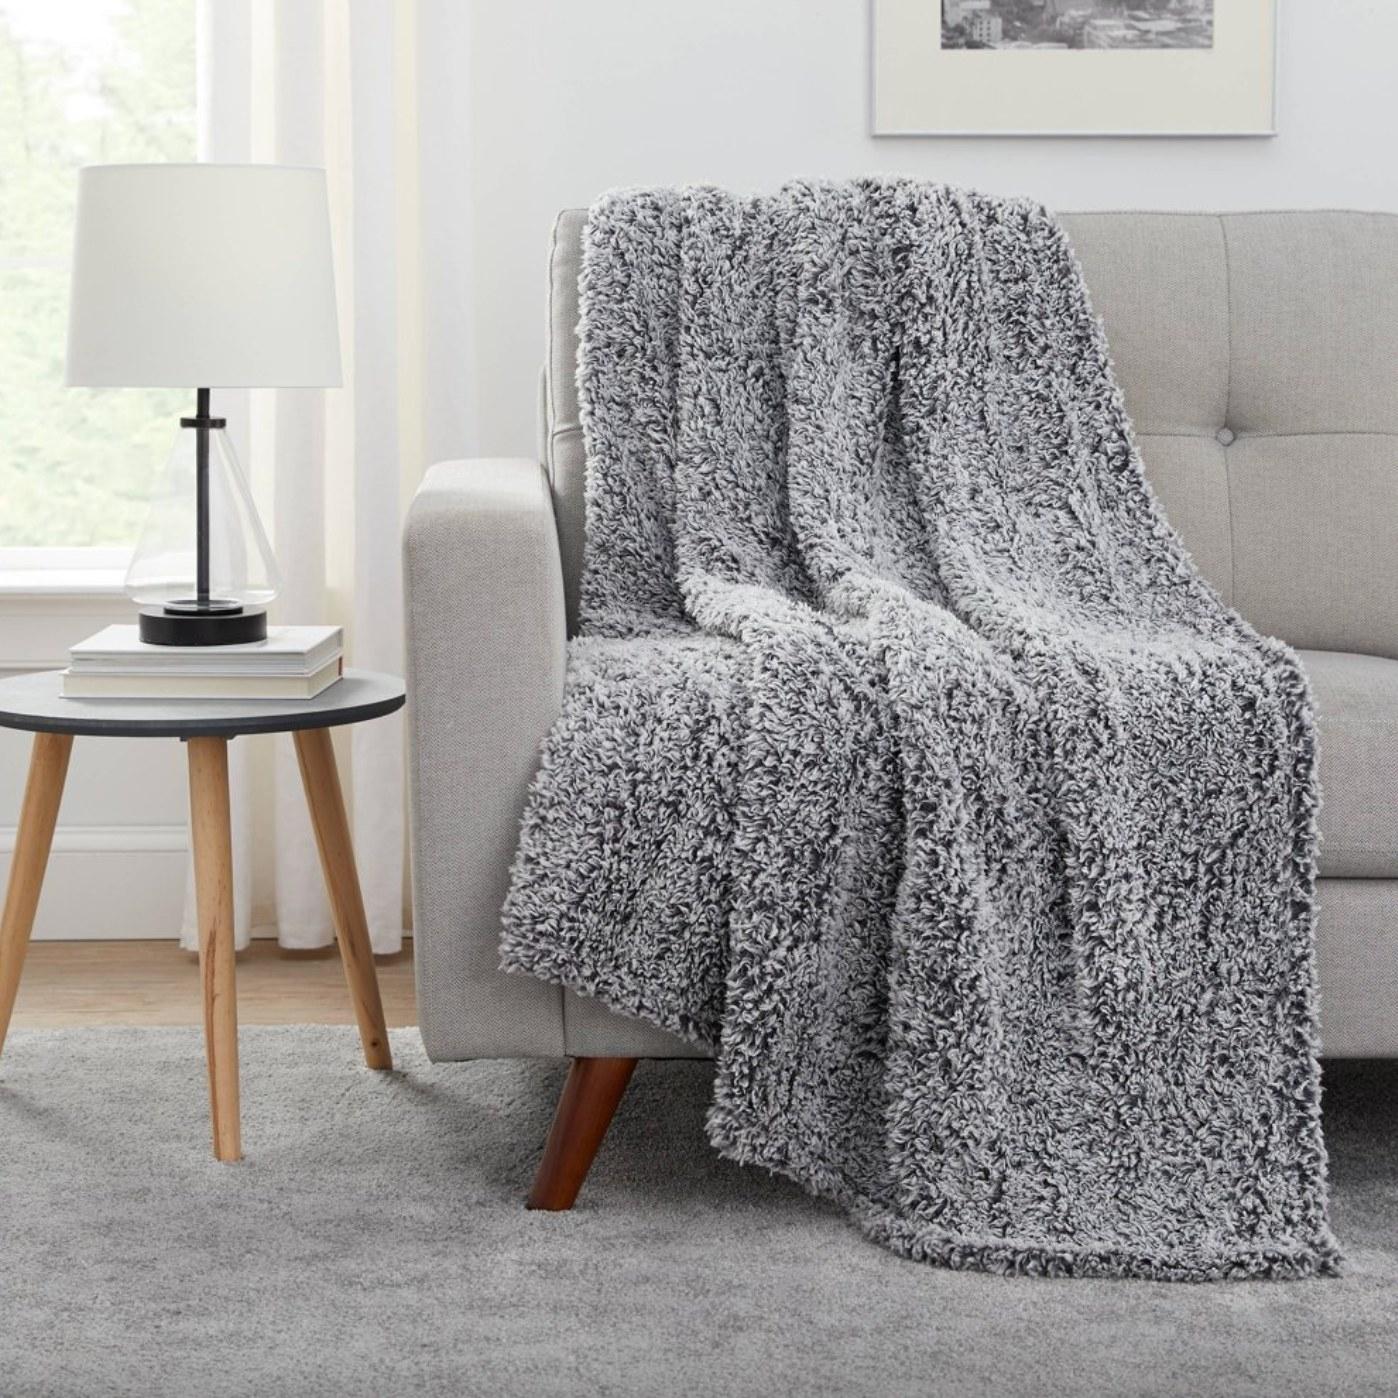 the lightweight sherpa blanket in gray